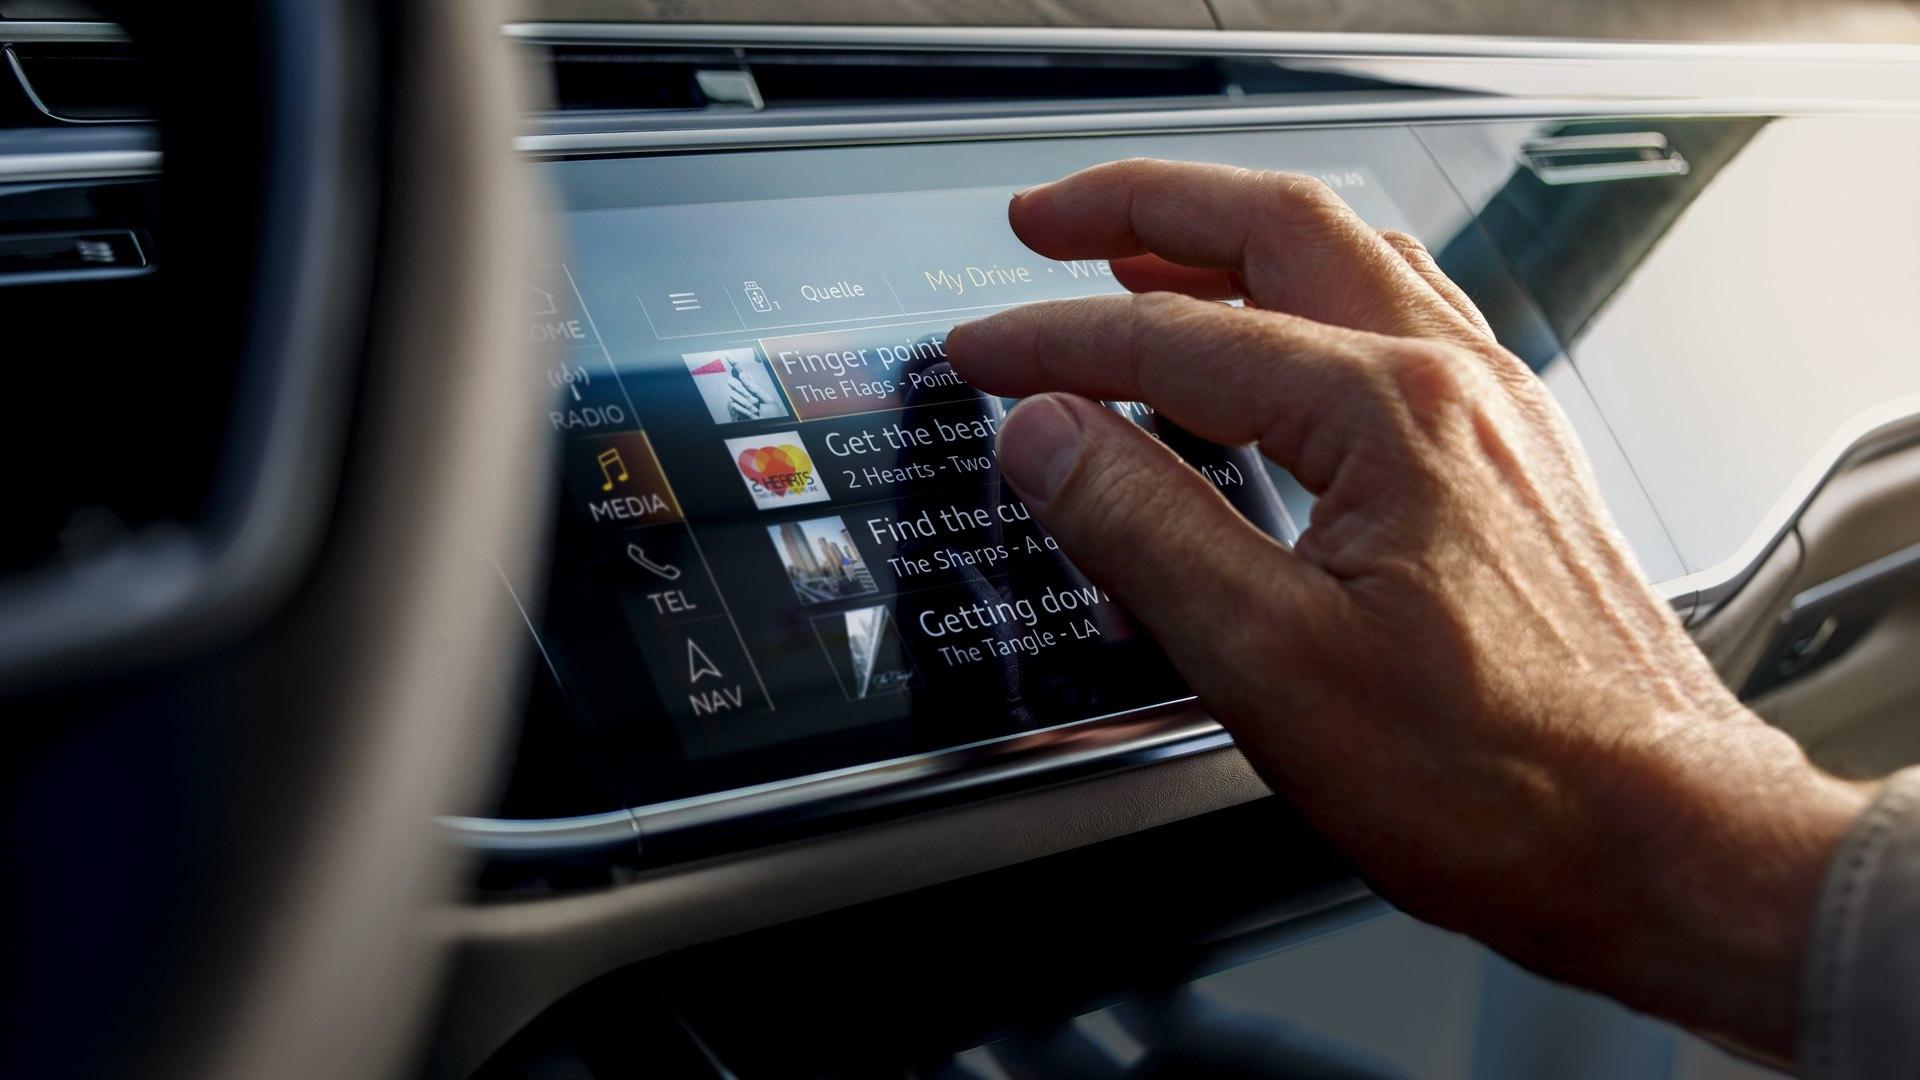 Audi A8 touchscreen